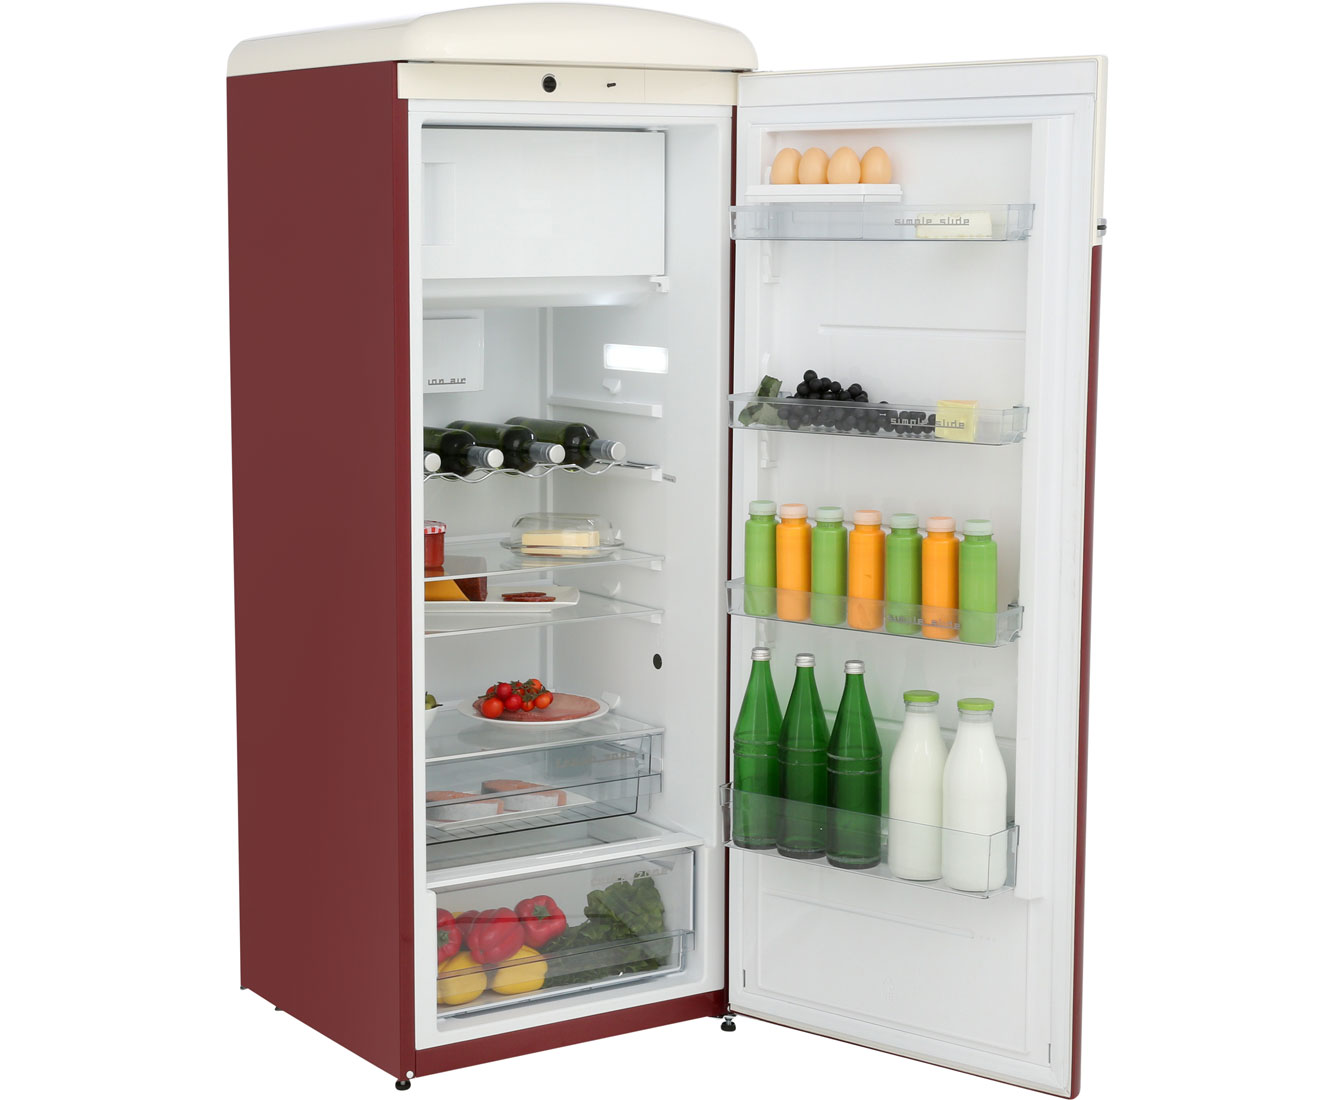 Gorenje Kühlschrank Vw Kaufen : Living kitchen gorenje